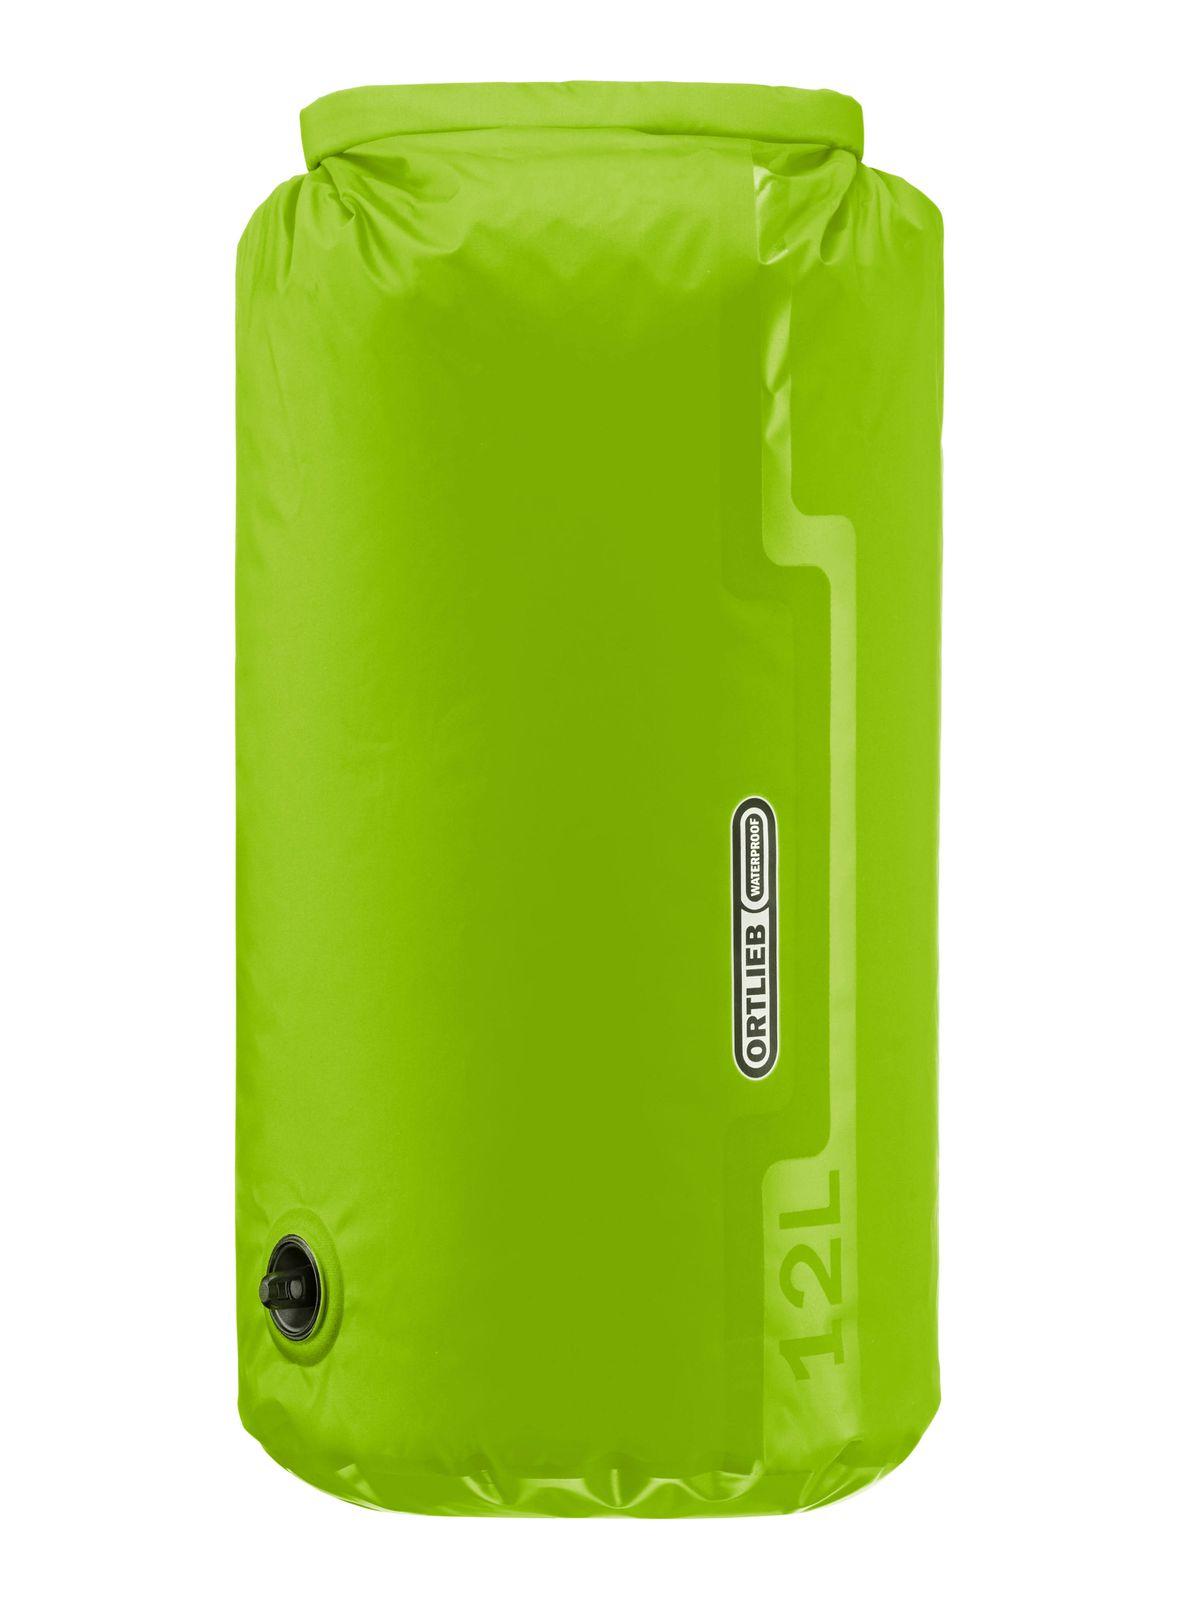 ORTLIEB Dry-Bag PS10 Valve 12L Light Green